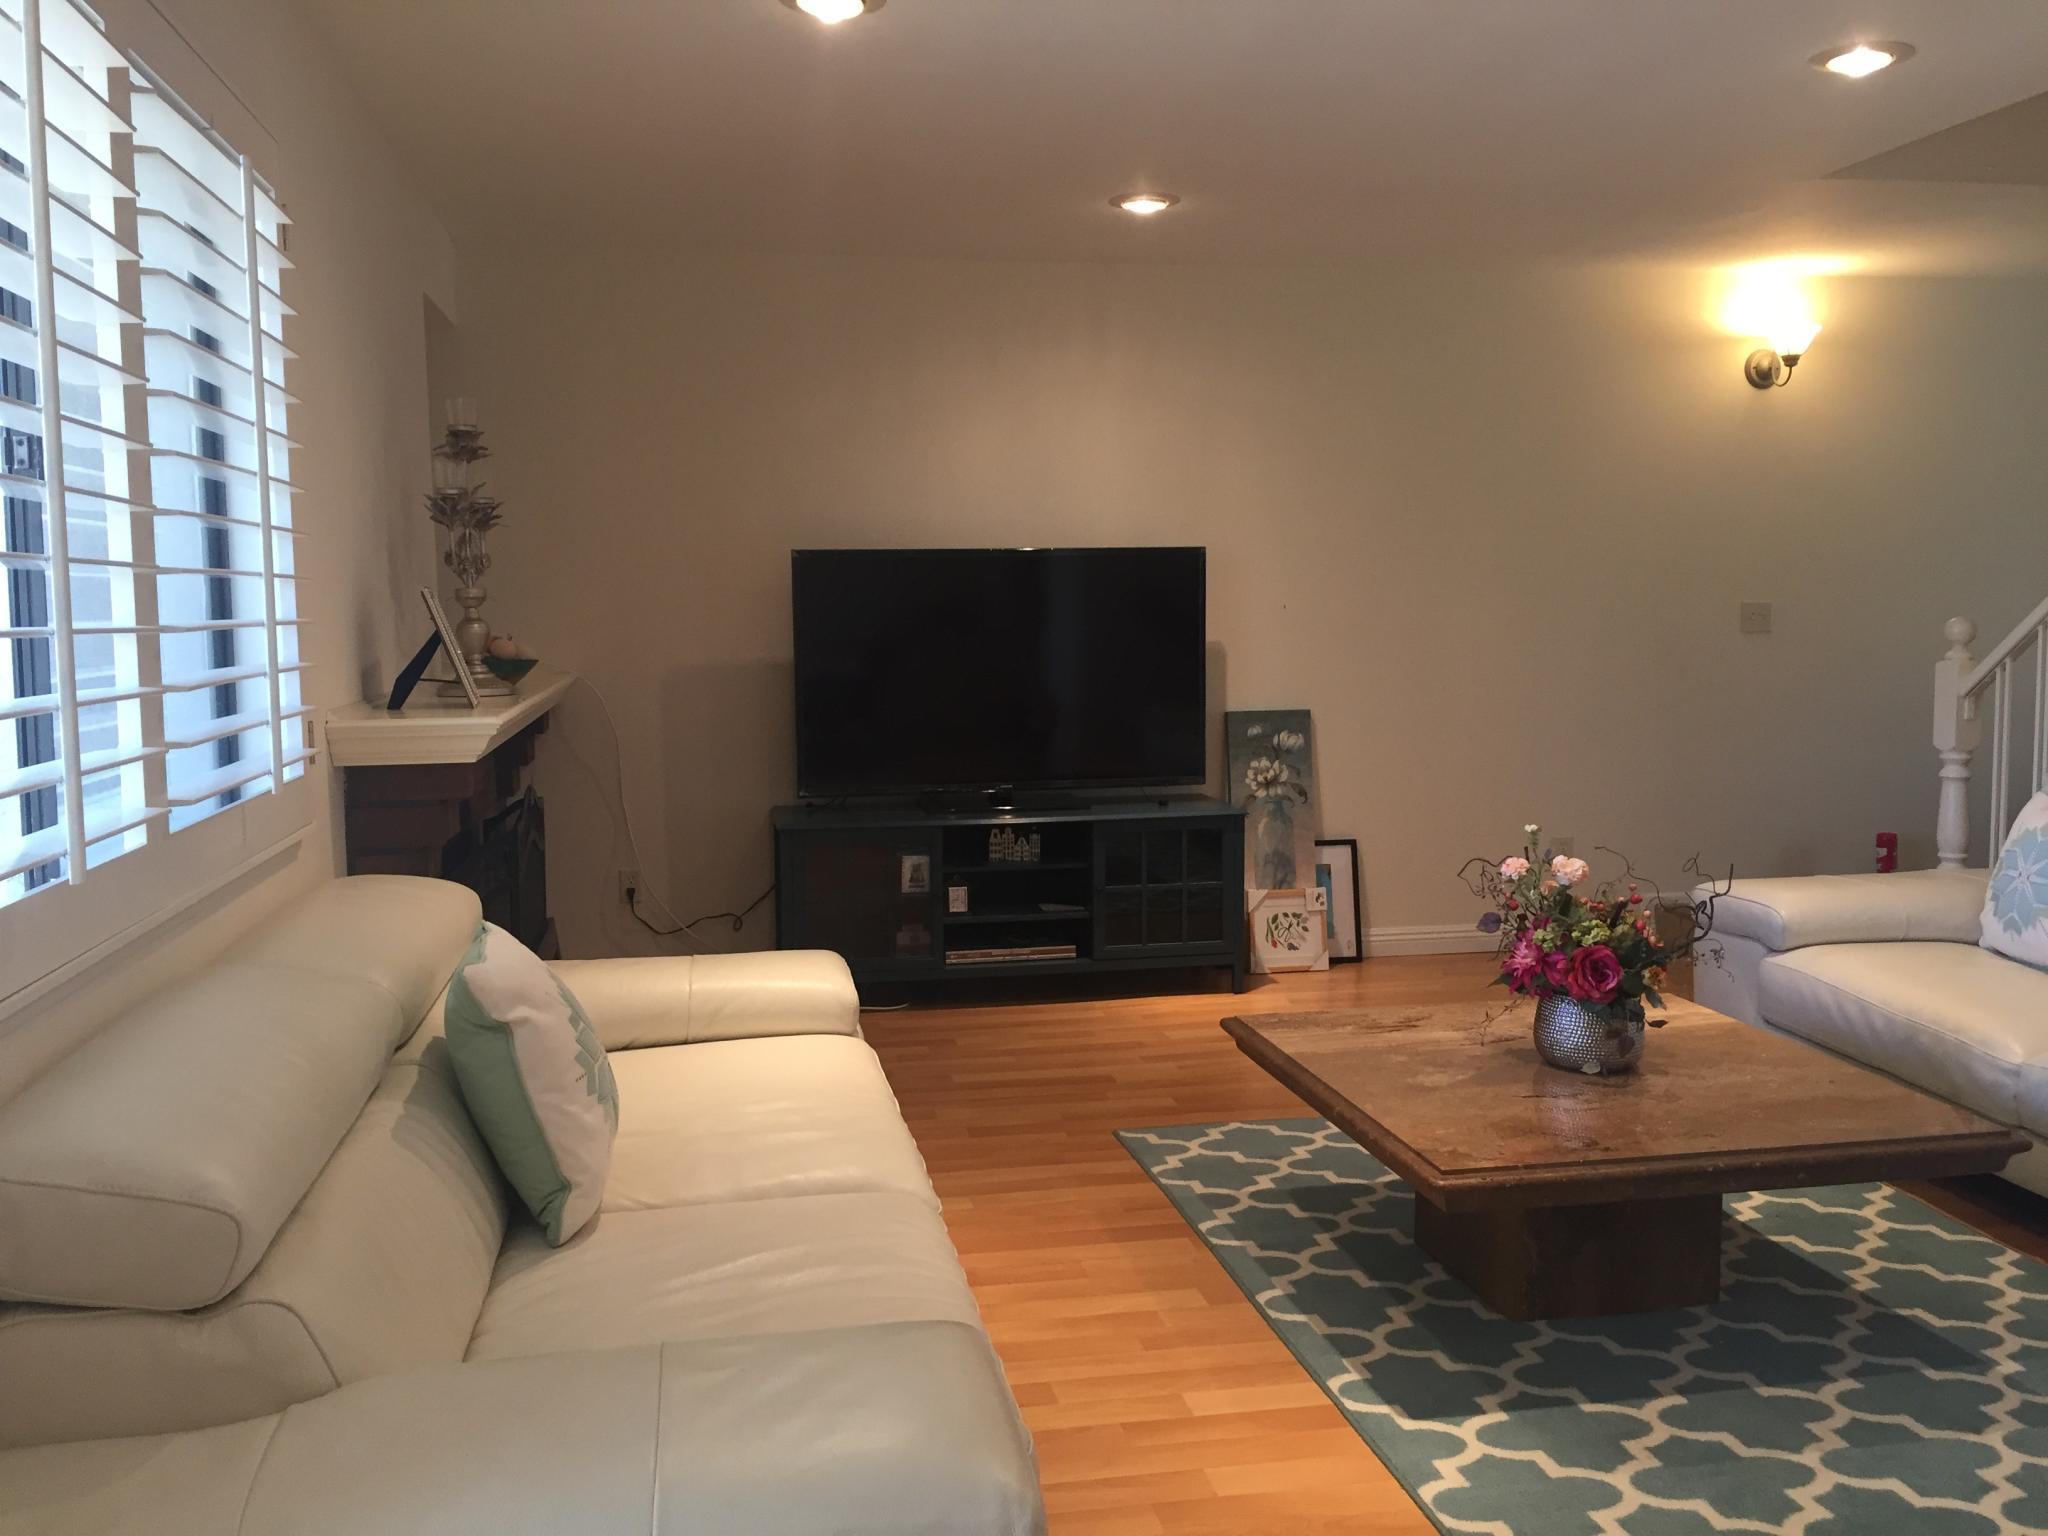 14440 Pickwick Ln, Garden Grove, CA 92844 For Rent   Trulia